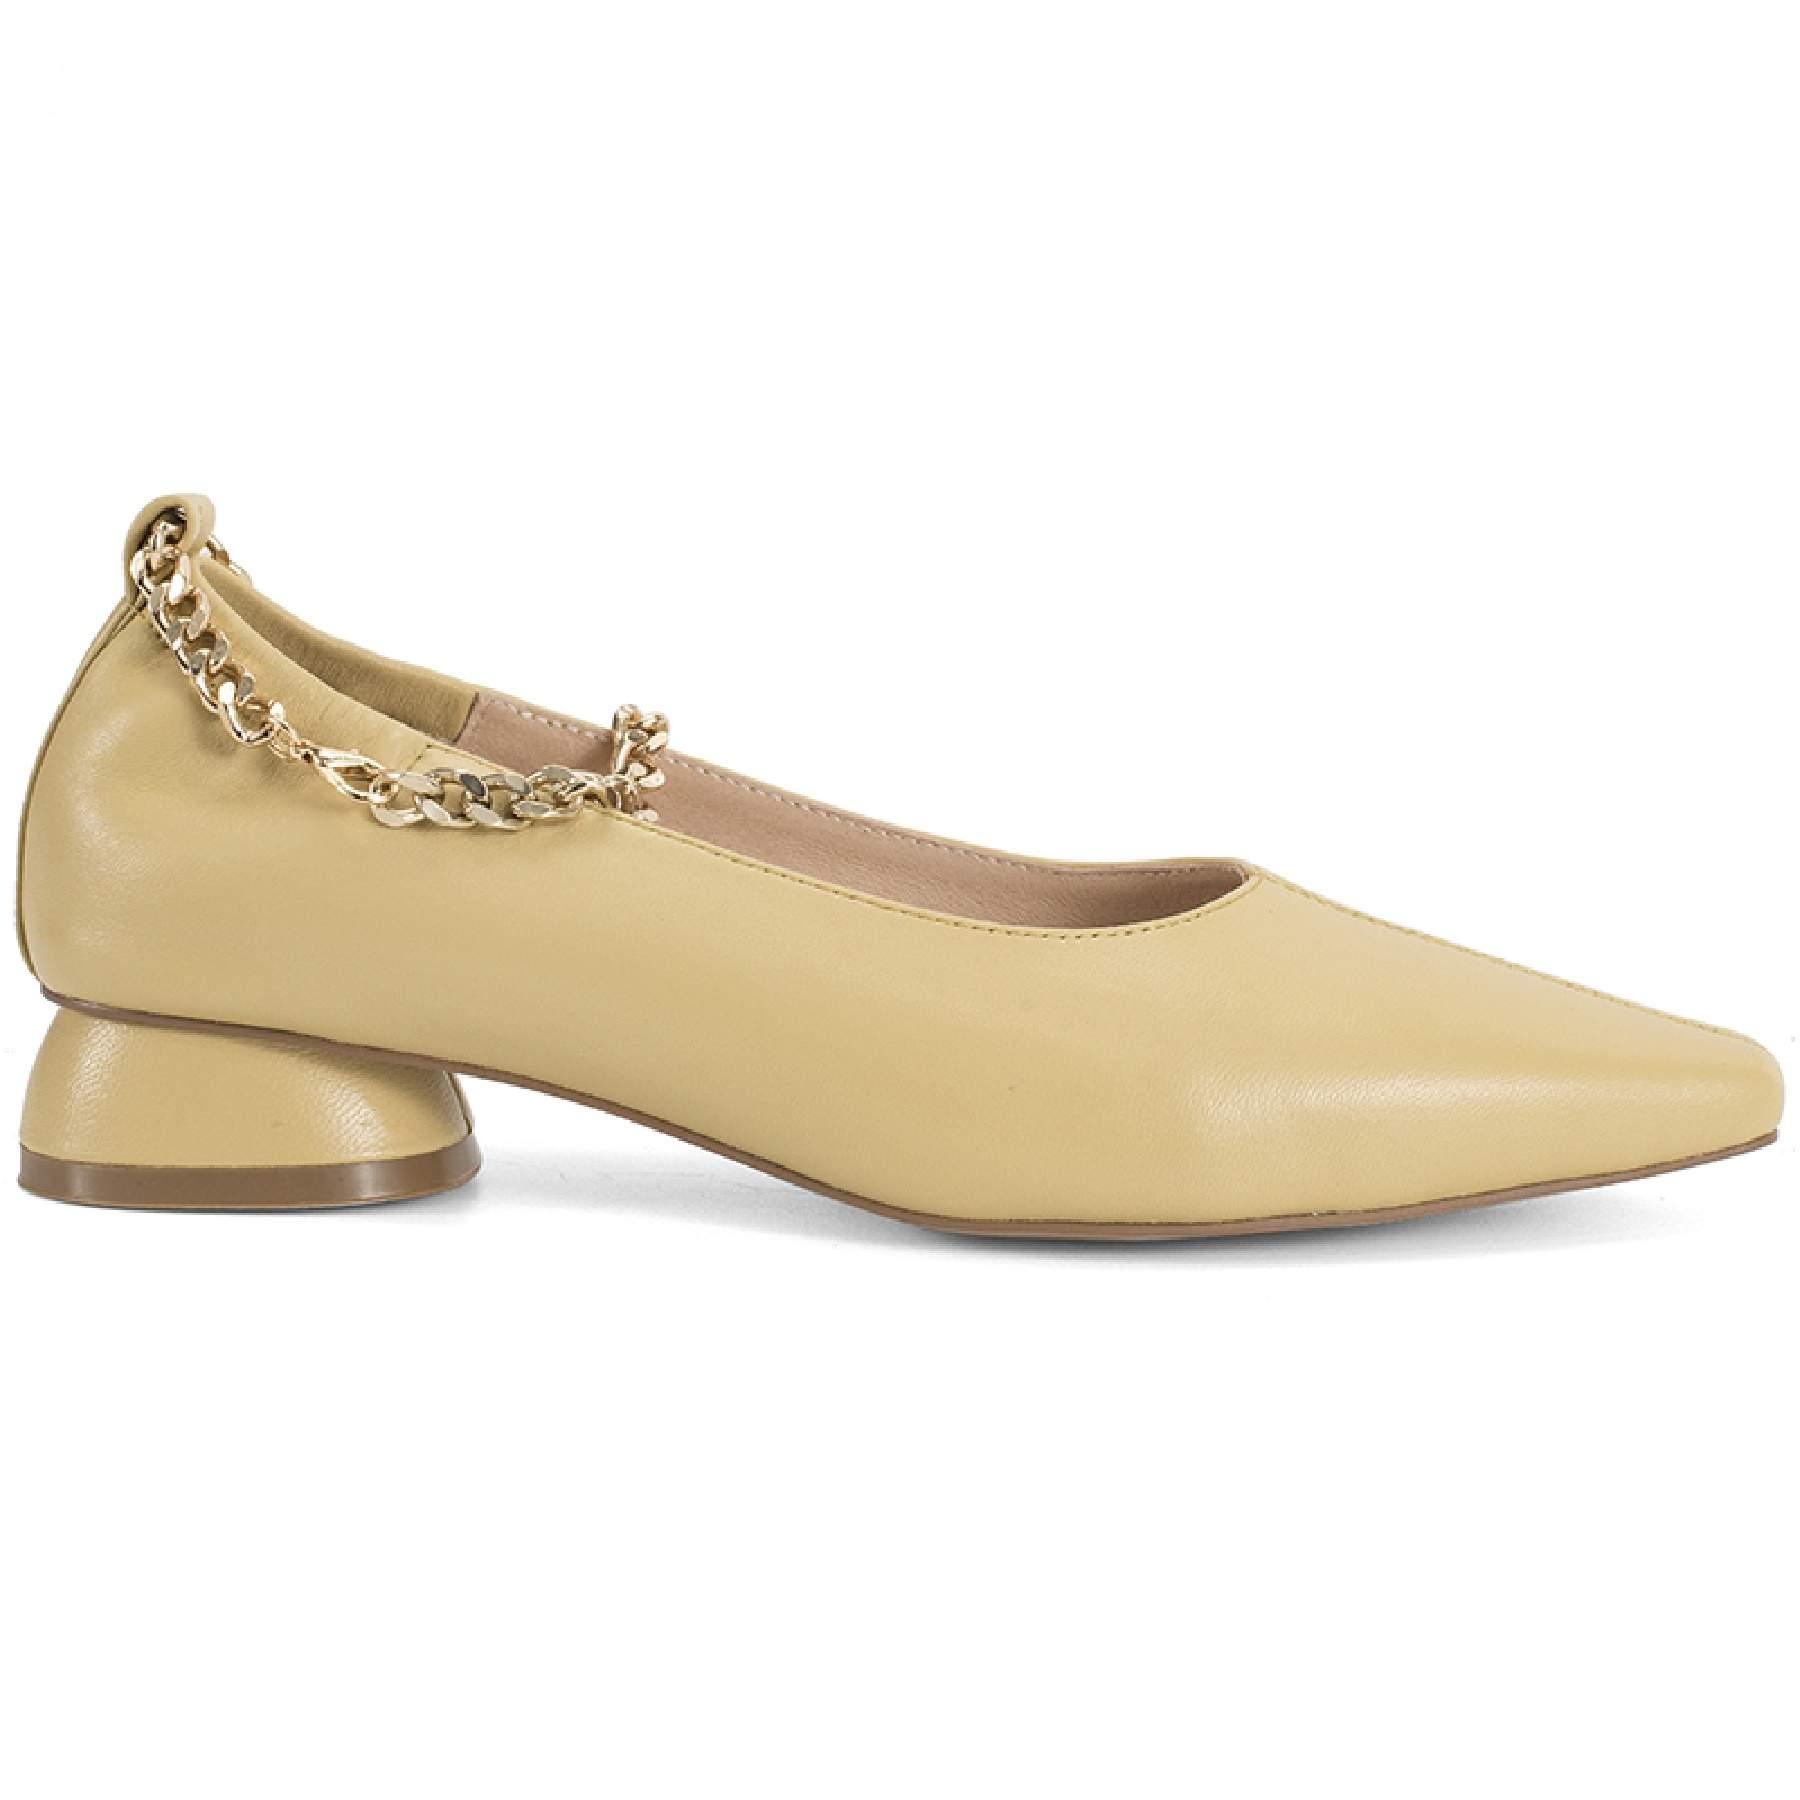 Туфли женские Portal PRL1104-06-21L желтые 35 RU